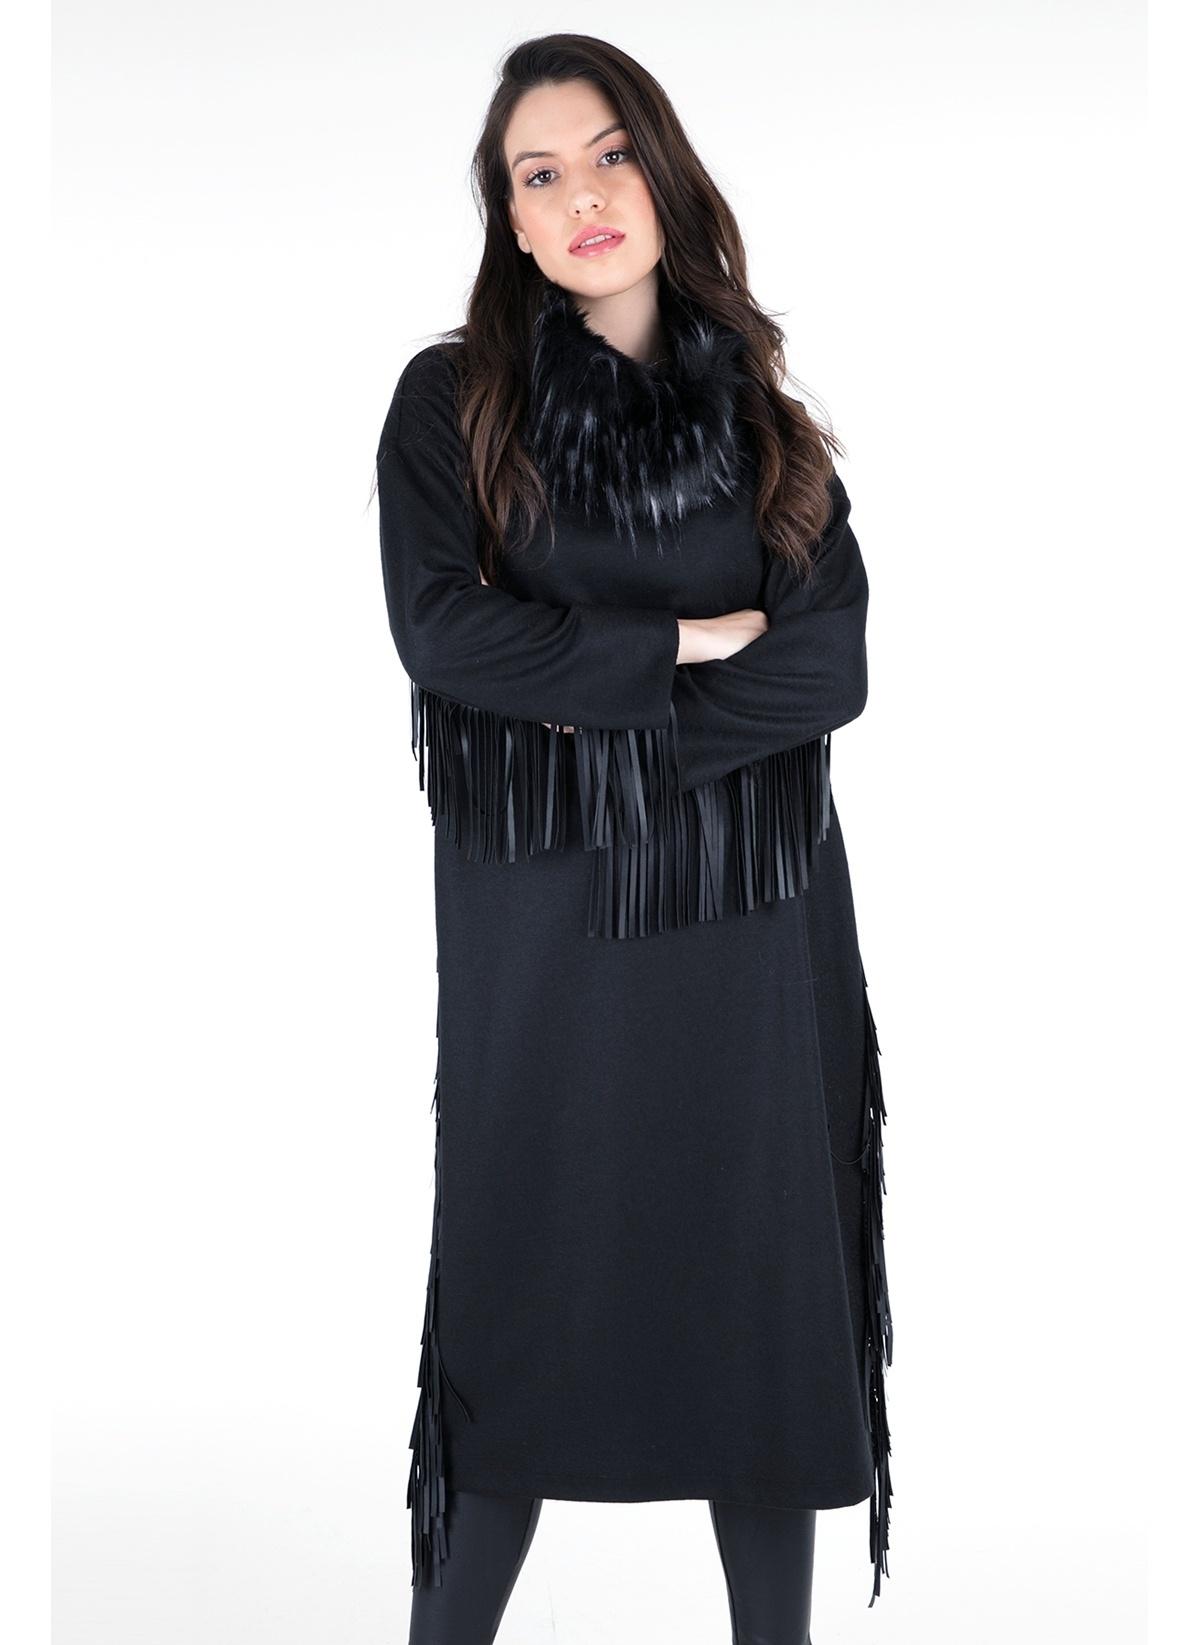 Trend Elbise Trend Kadın Elbise 4784104